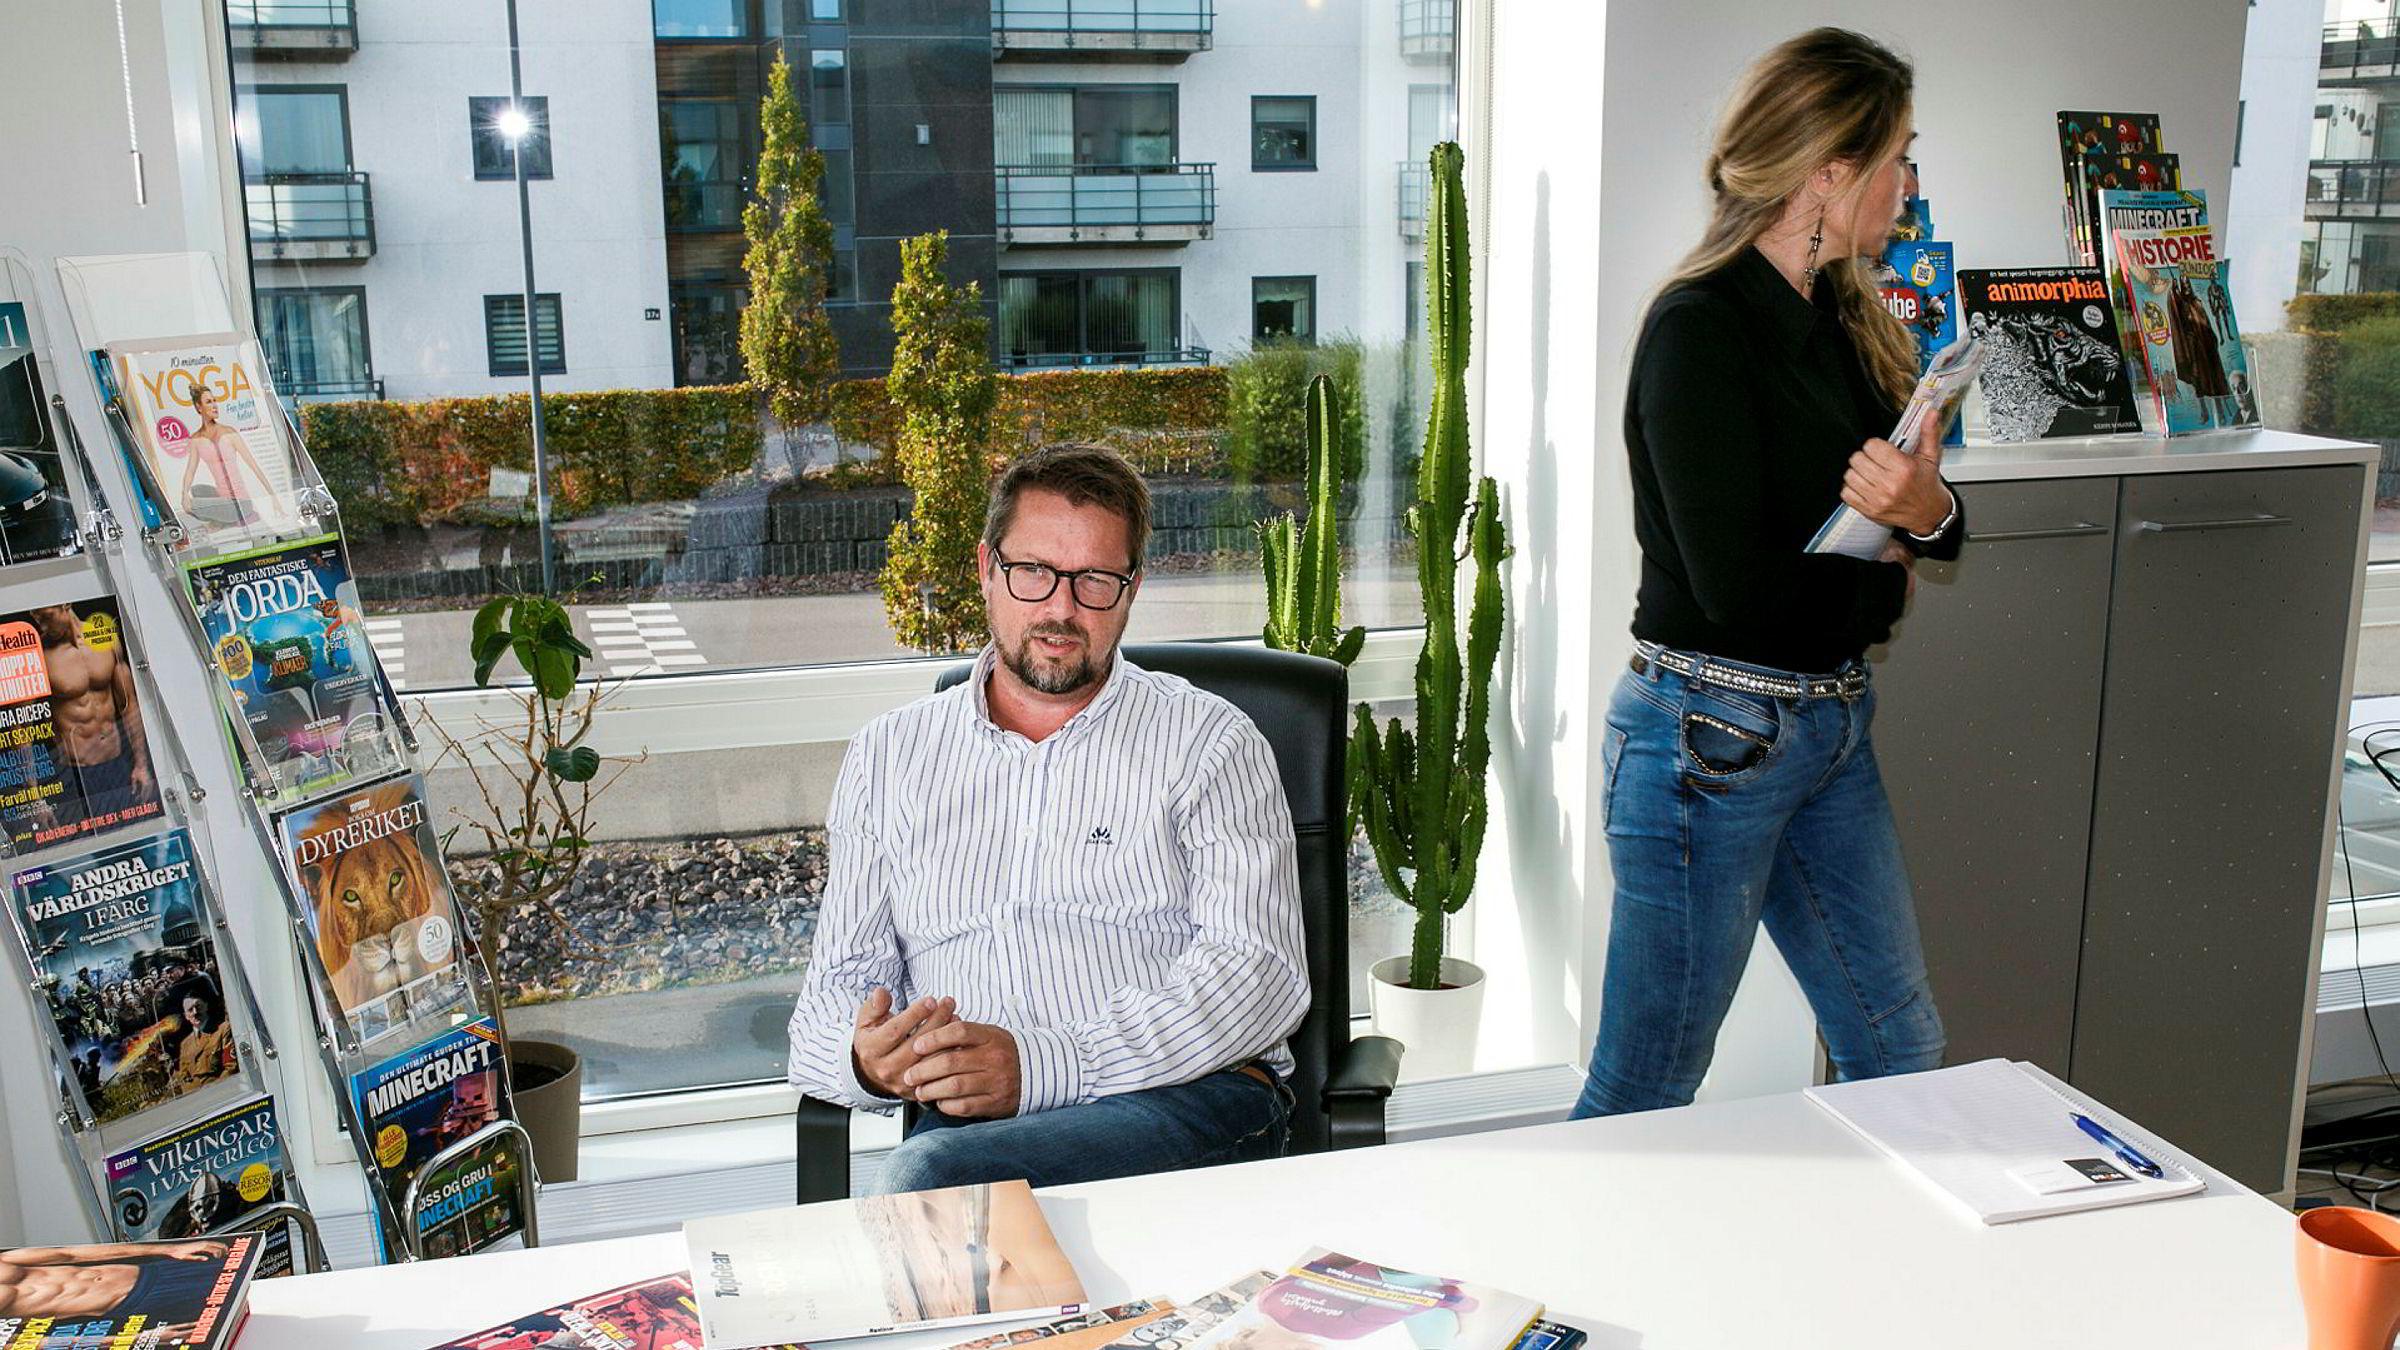 Forlagssjef Øyvind Therkelsen og redaktør Line Therkelsen hos bokasin forlaget Orage. De er også gift.